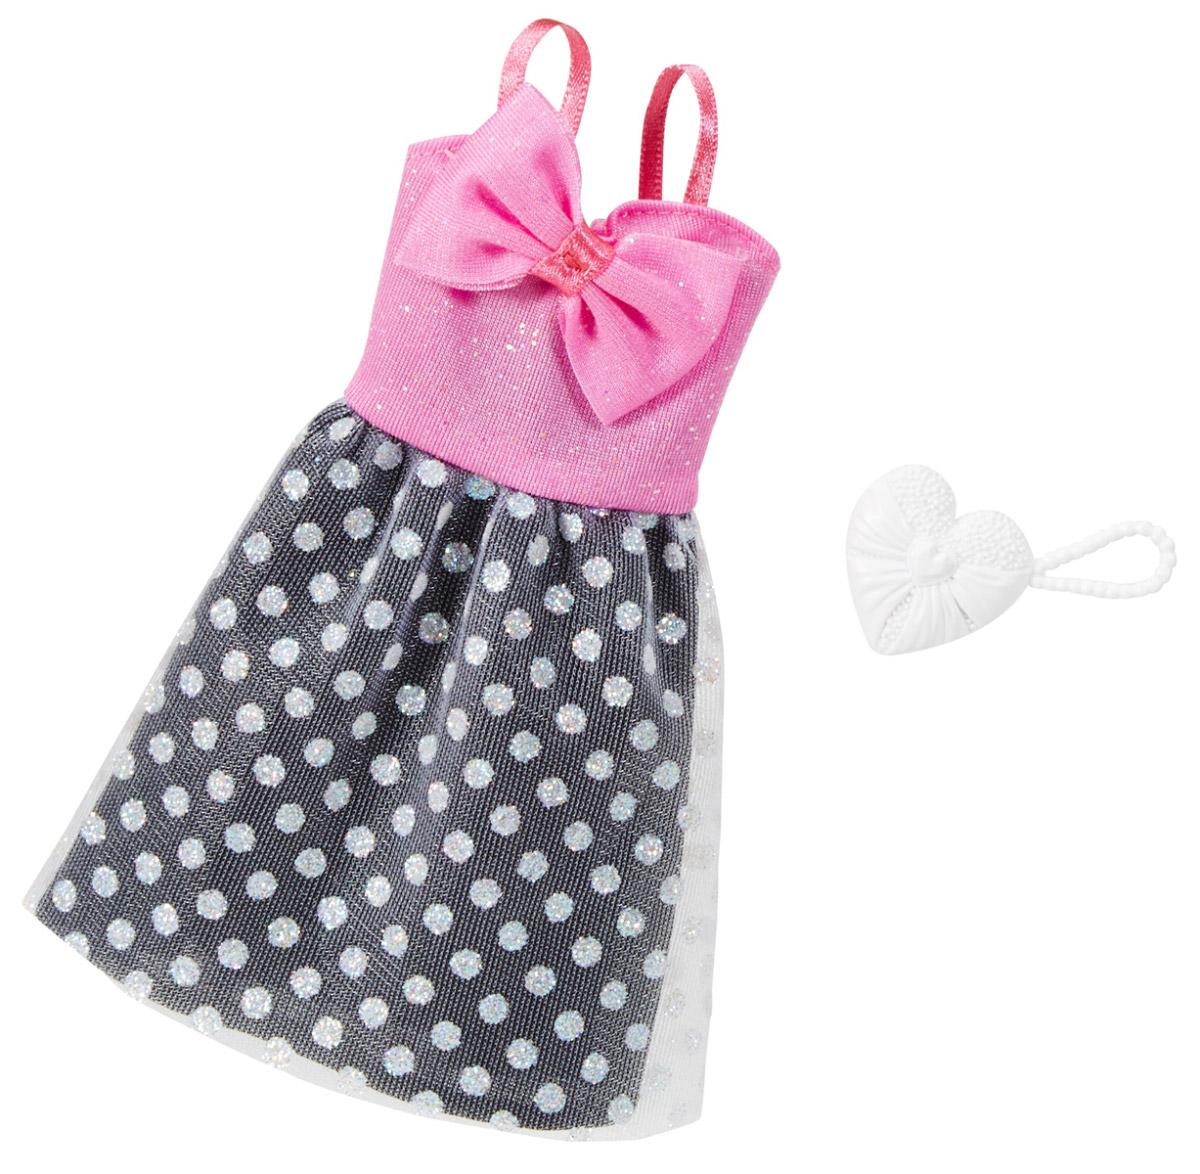 Barbie Одежда для кукол Платье Evening Glam цвет серый розовый FCT22_FCT32